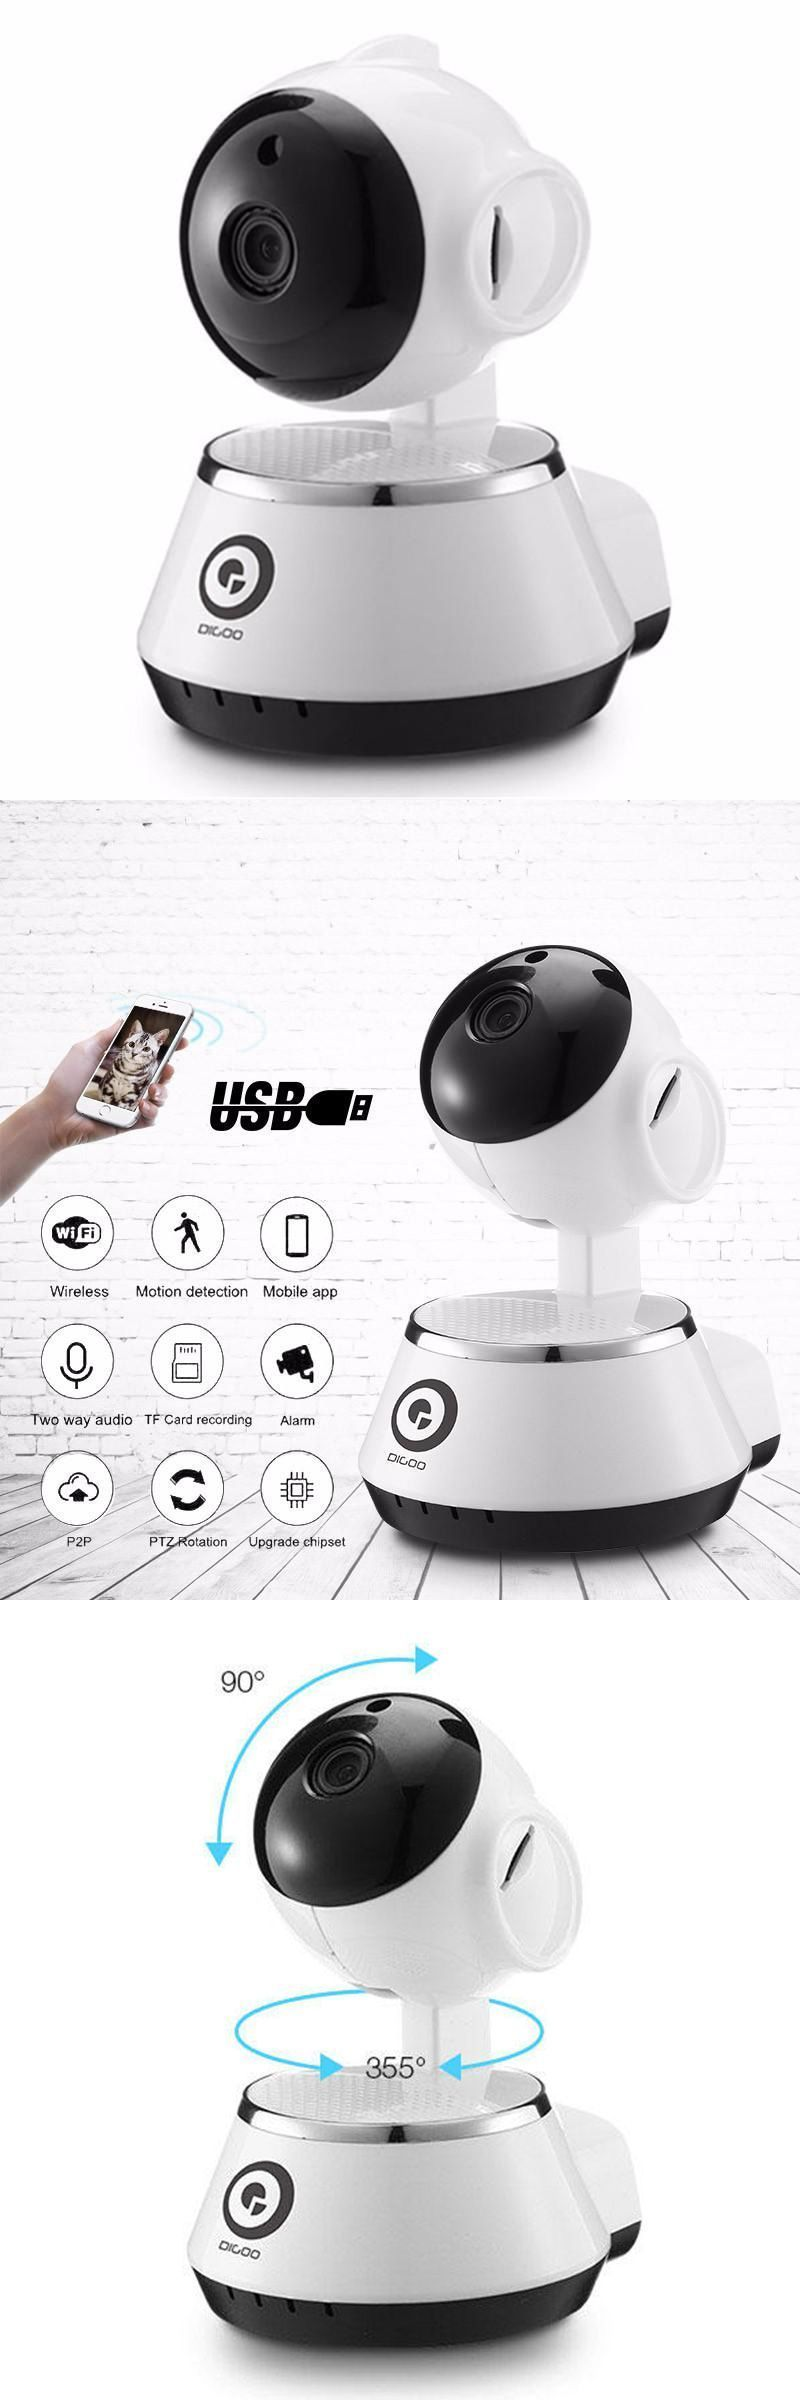 Digoo BB-M1 Wireless WiFi USB Baby Monitor Alarm Home Security IP Camera HD 720P